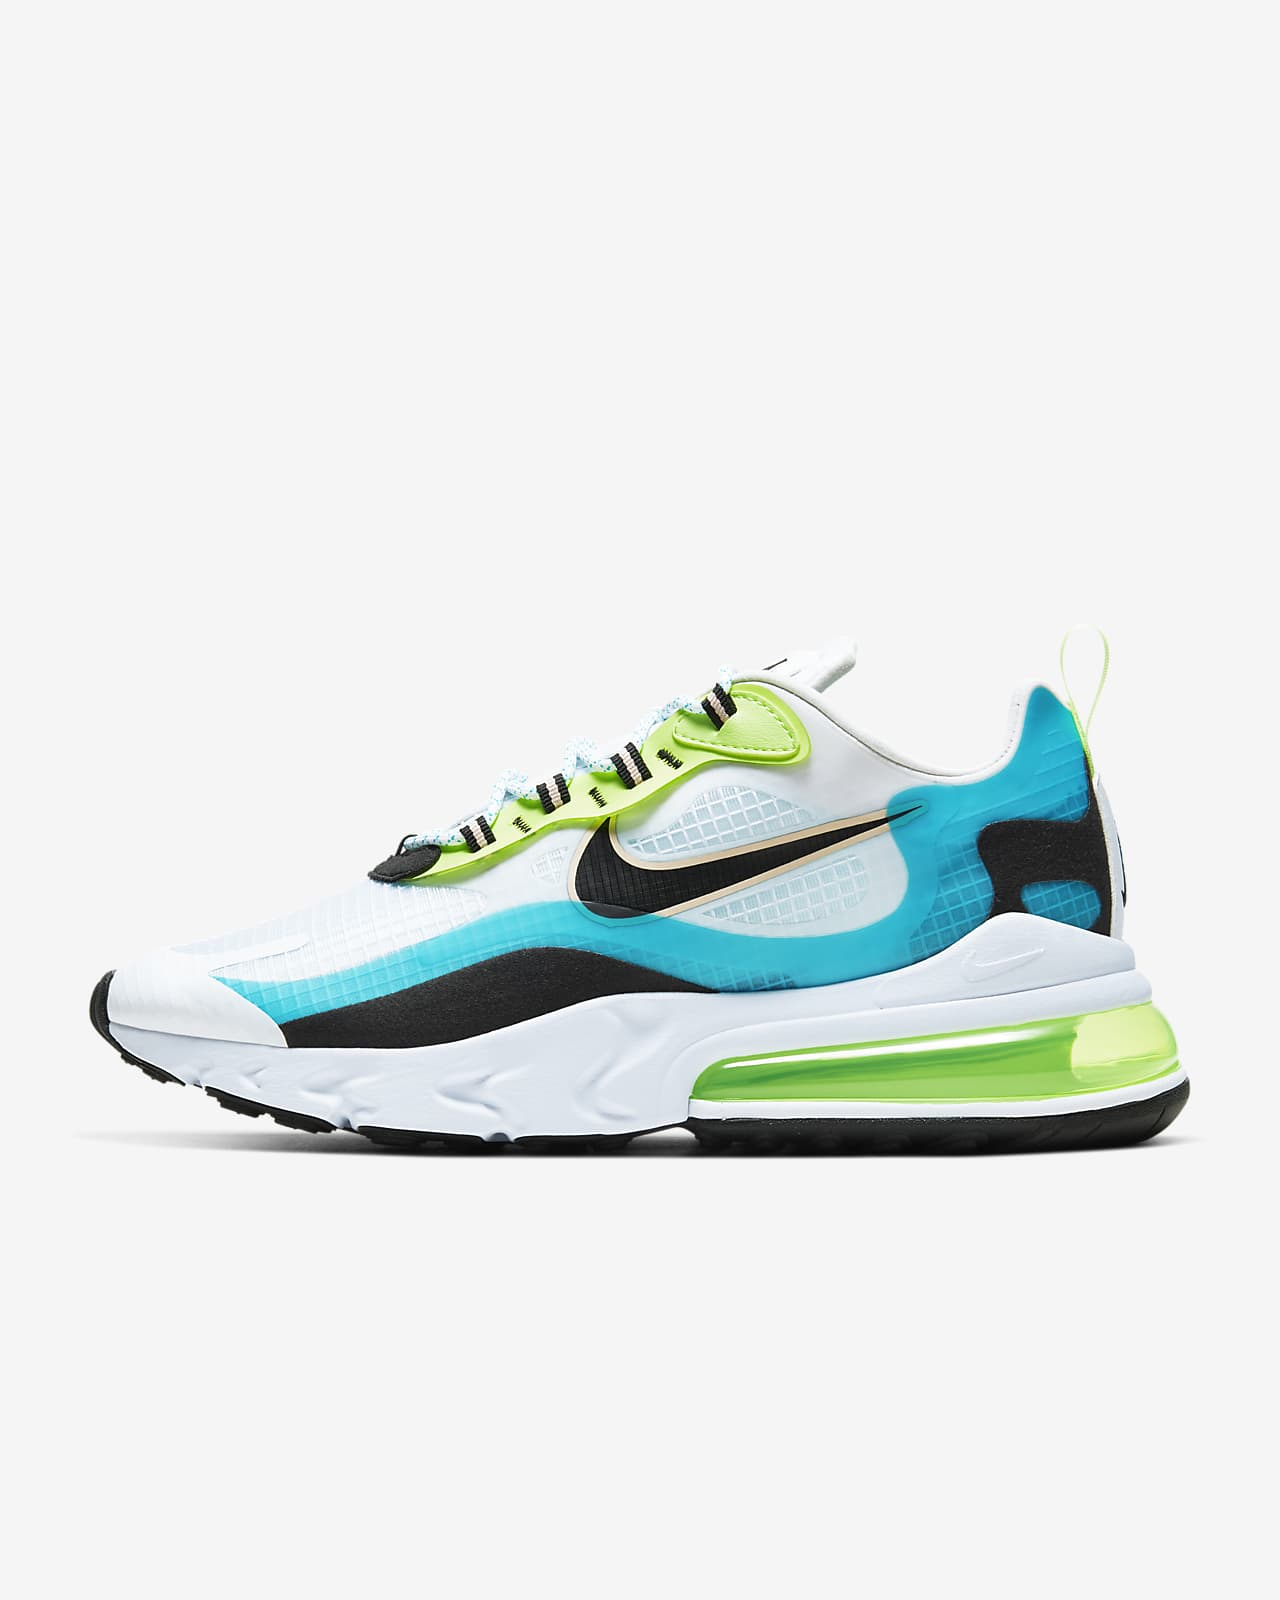 Chaussure Nike Air Max 270 React SE pour Homme